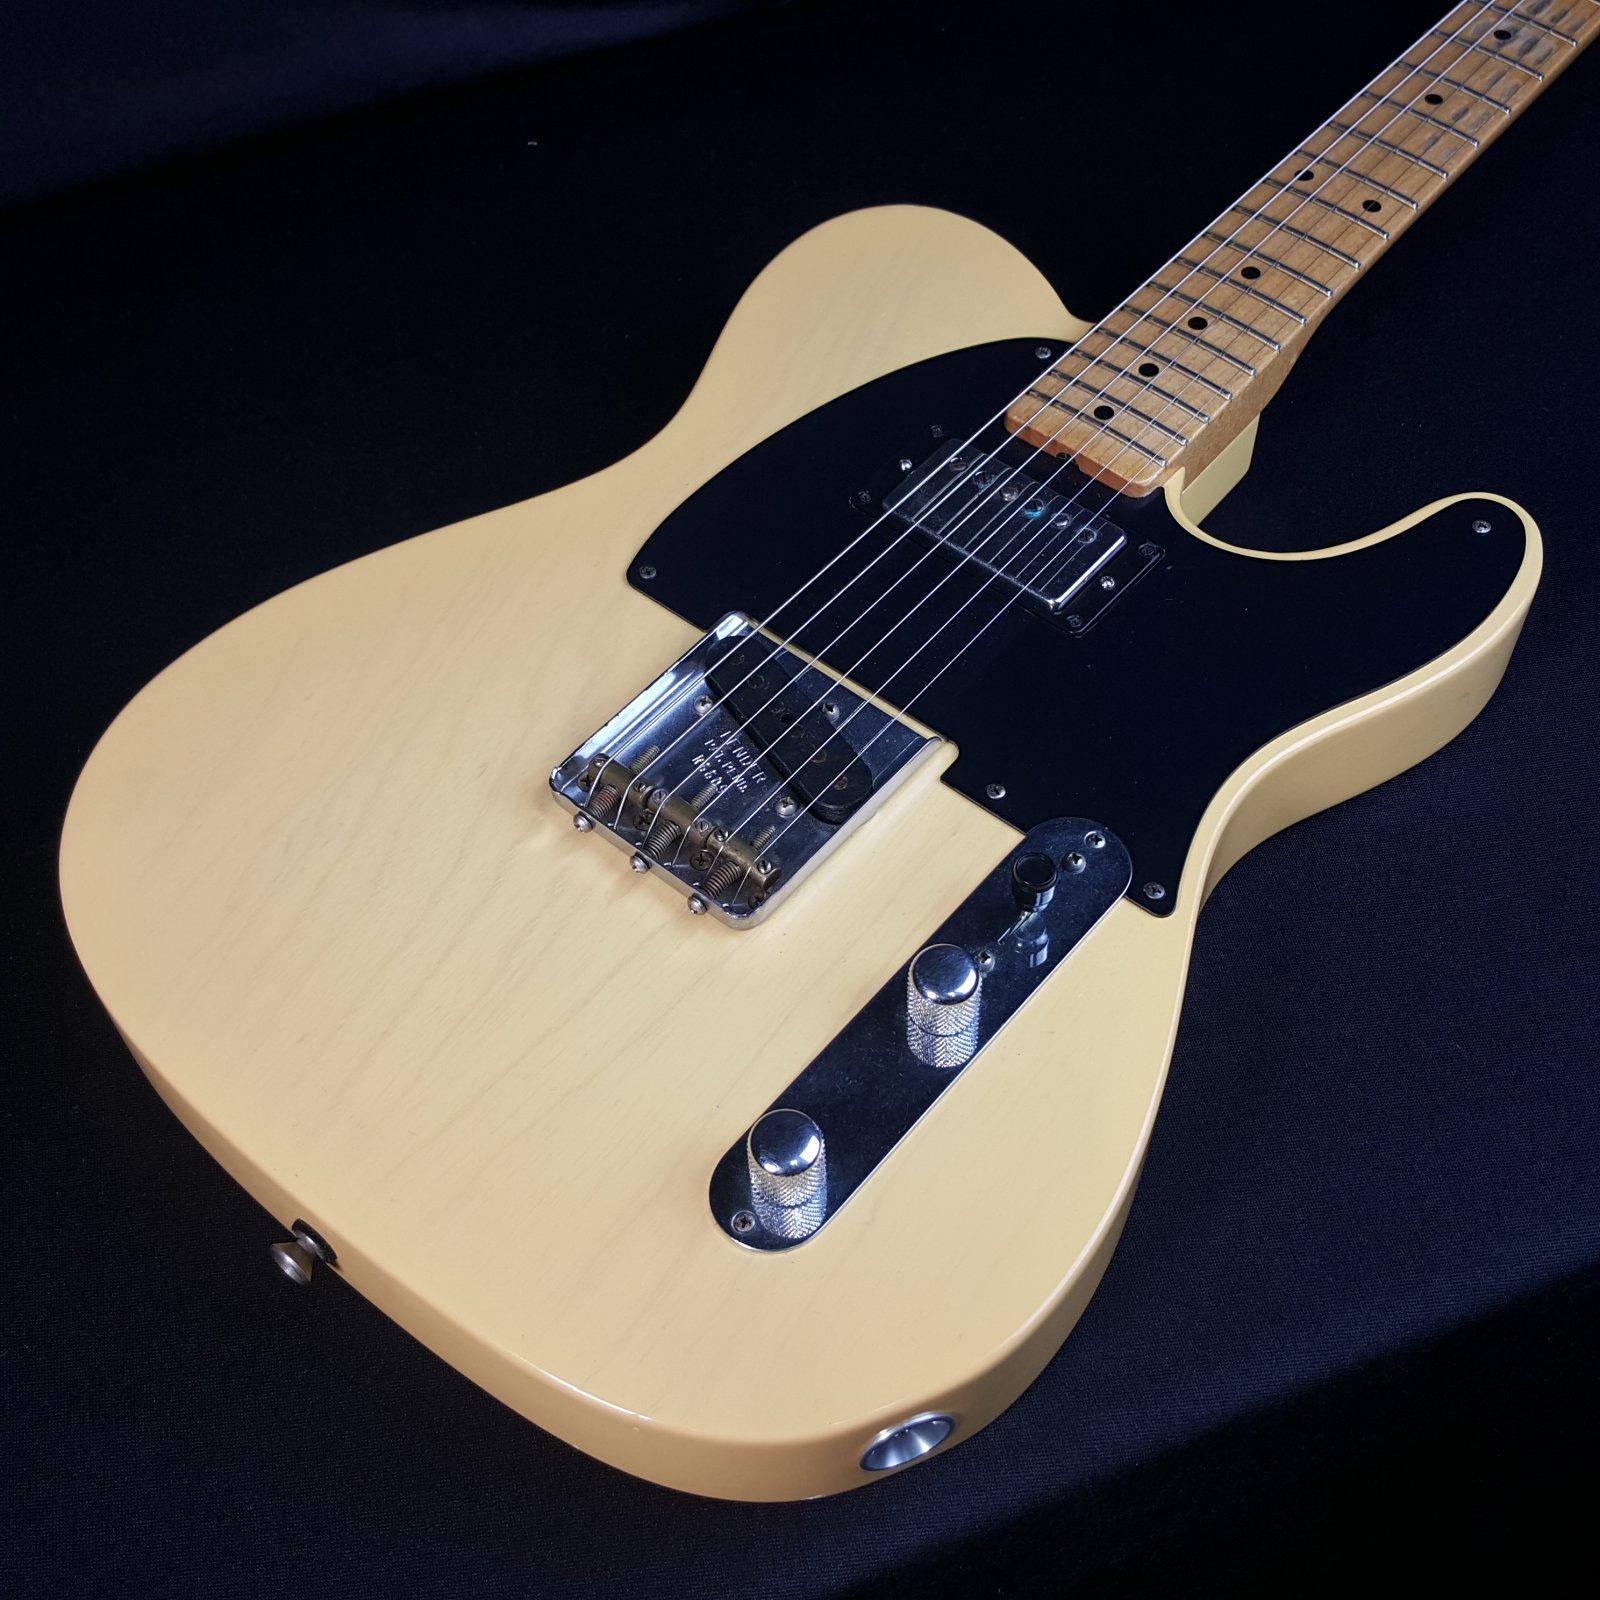 USED Fender Custom Shop 1952 Telecaster Relic w/Hard Case